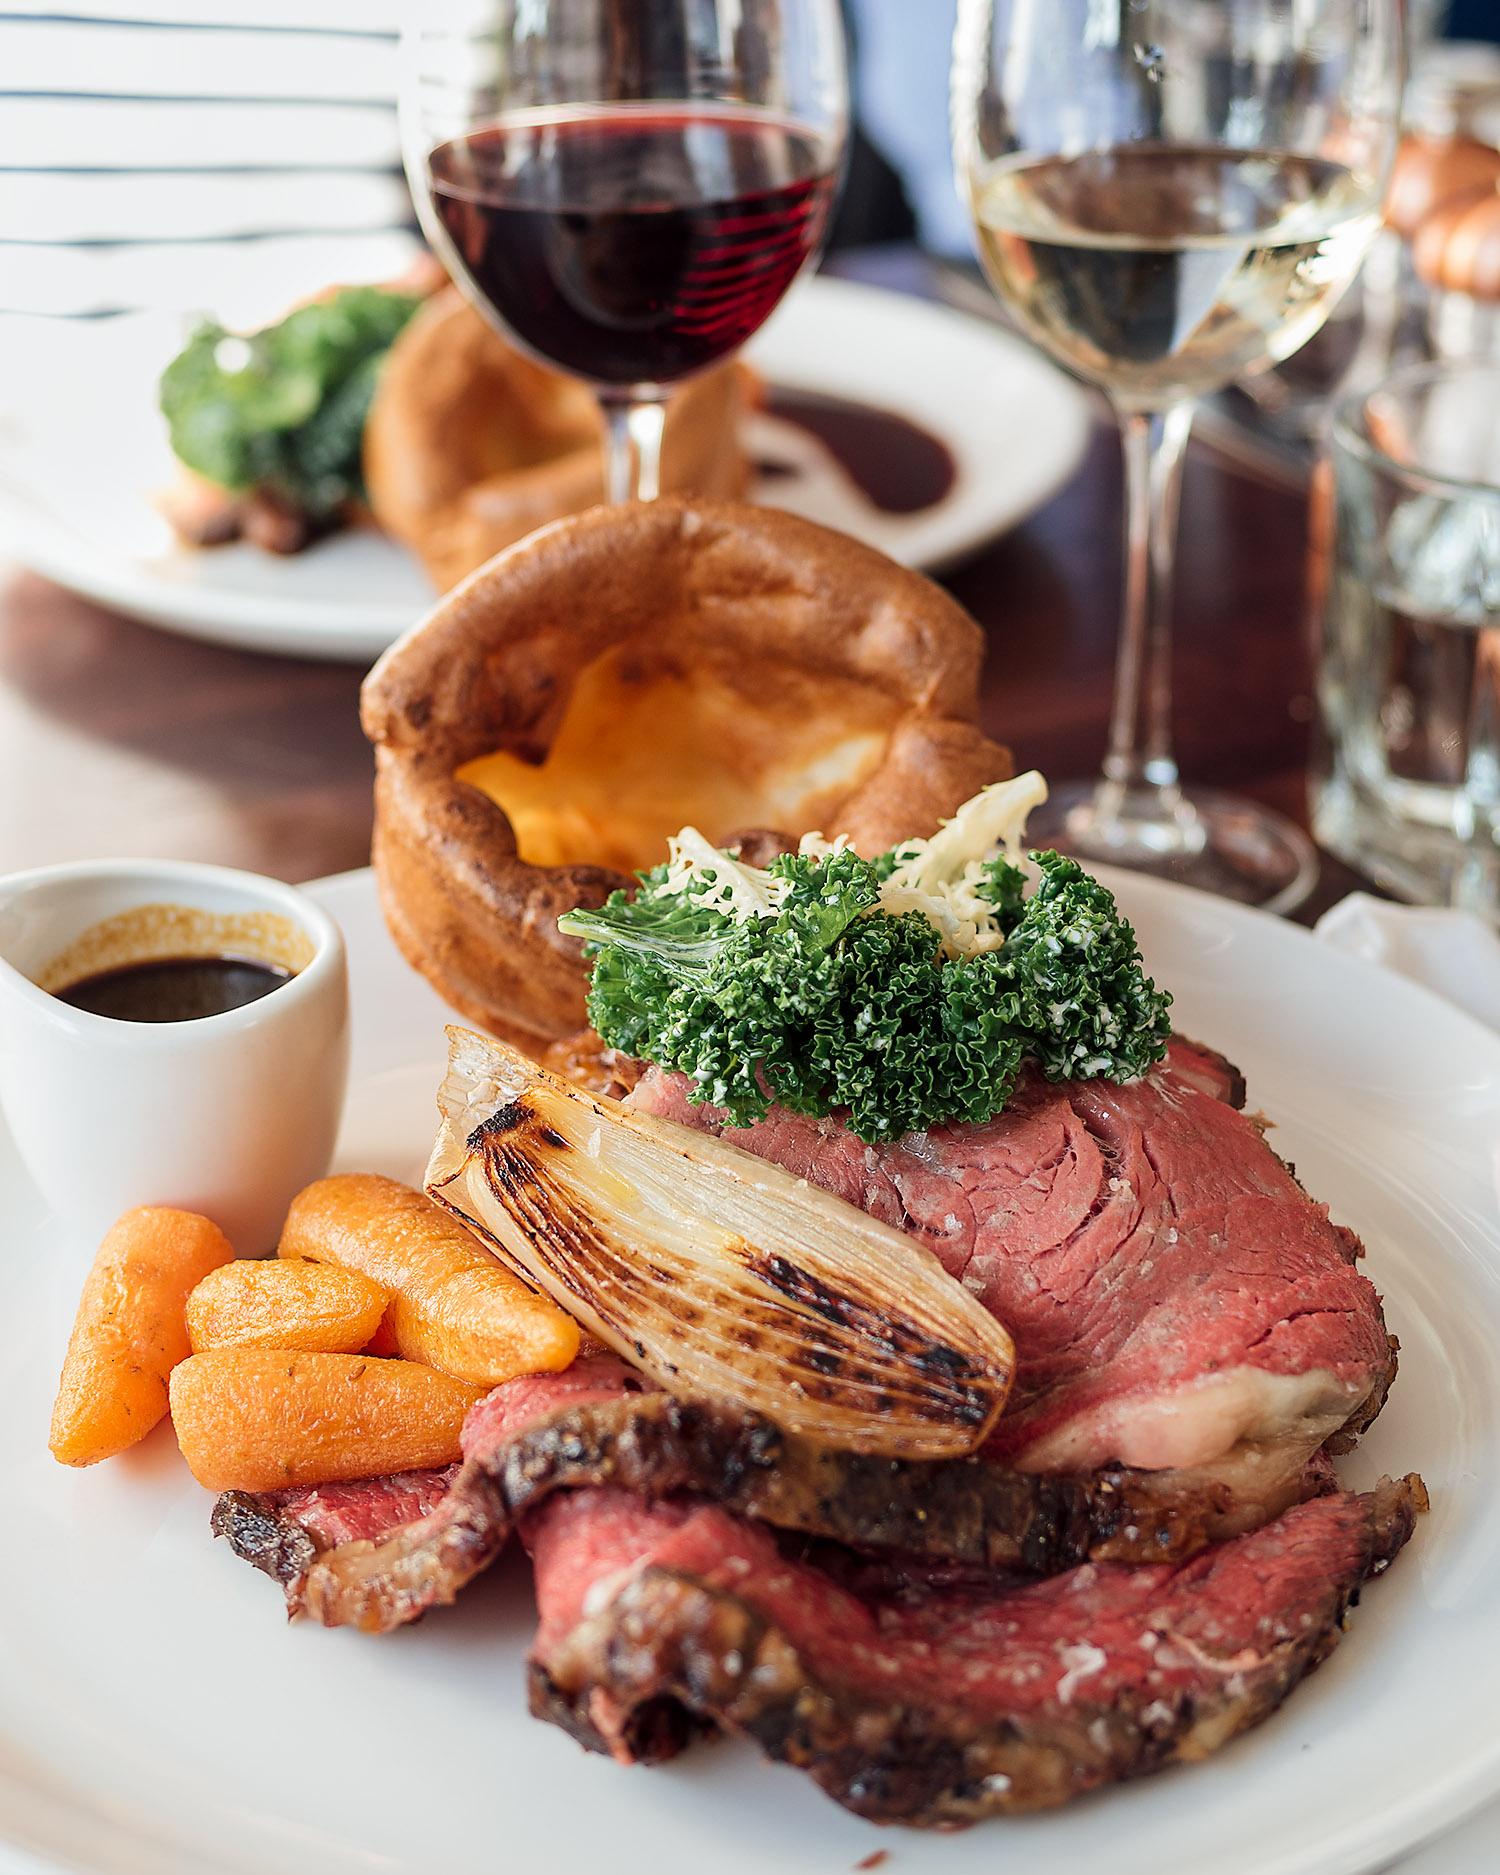 The main event, Sunday roast beef at Orto restaurant, Edinburgh